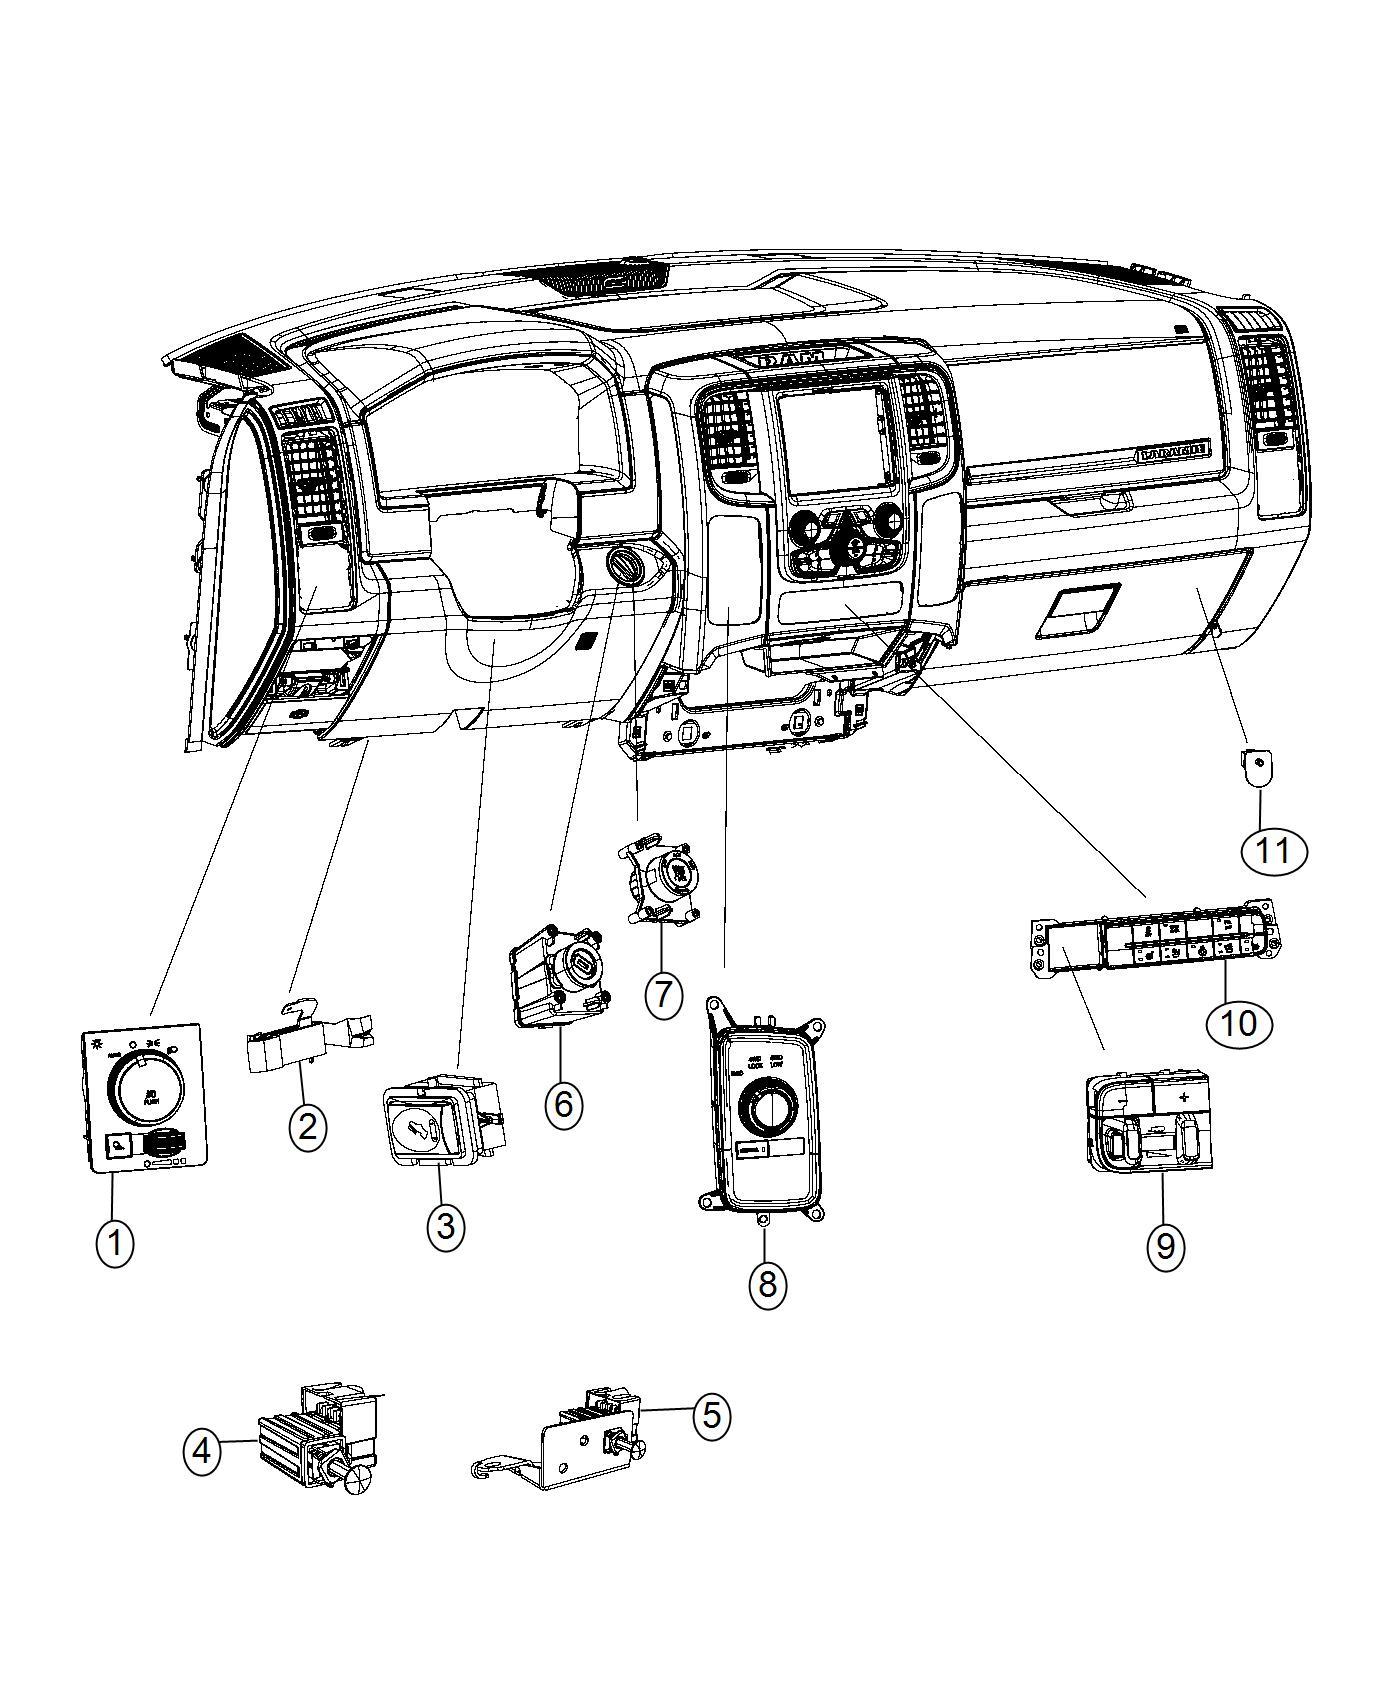 2013 Dodge Ram 3500 Switch. Instrument panel, trailer